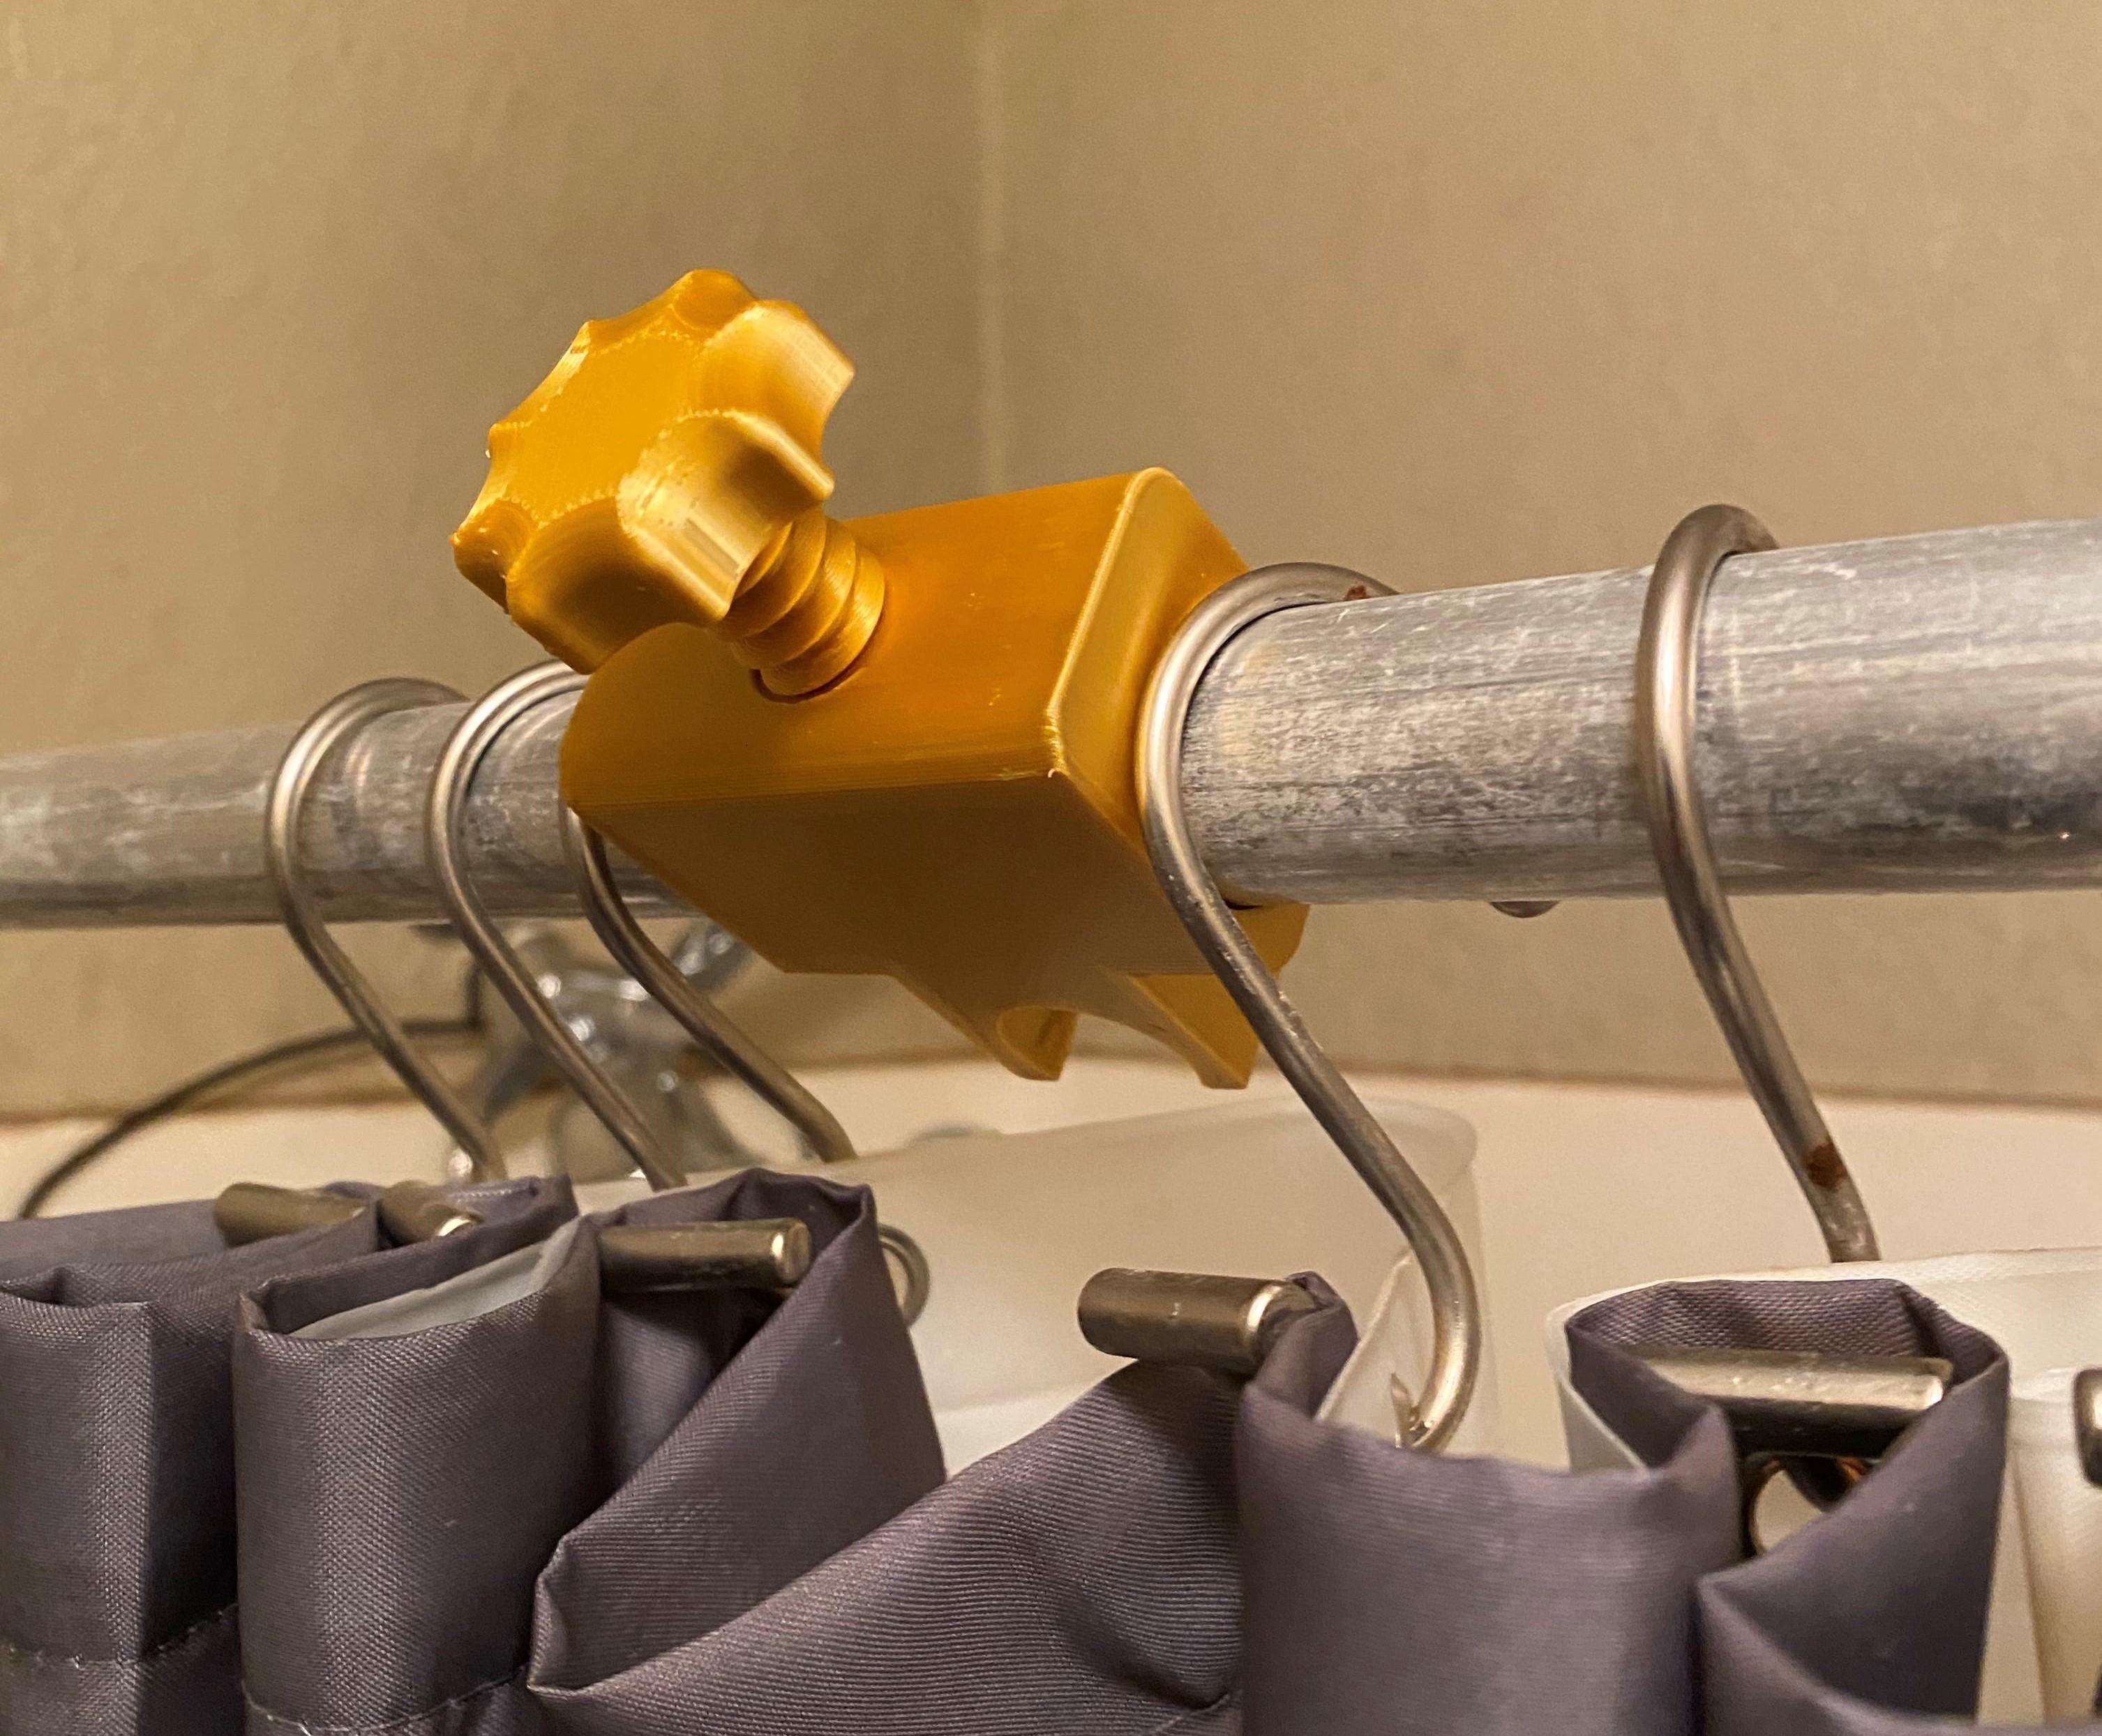 Shower Head Holder Rears.jpg Download free STL file Shower Head Holder • 3D printing template, HomeLite